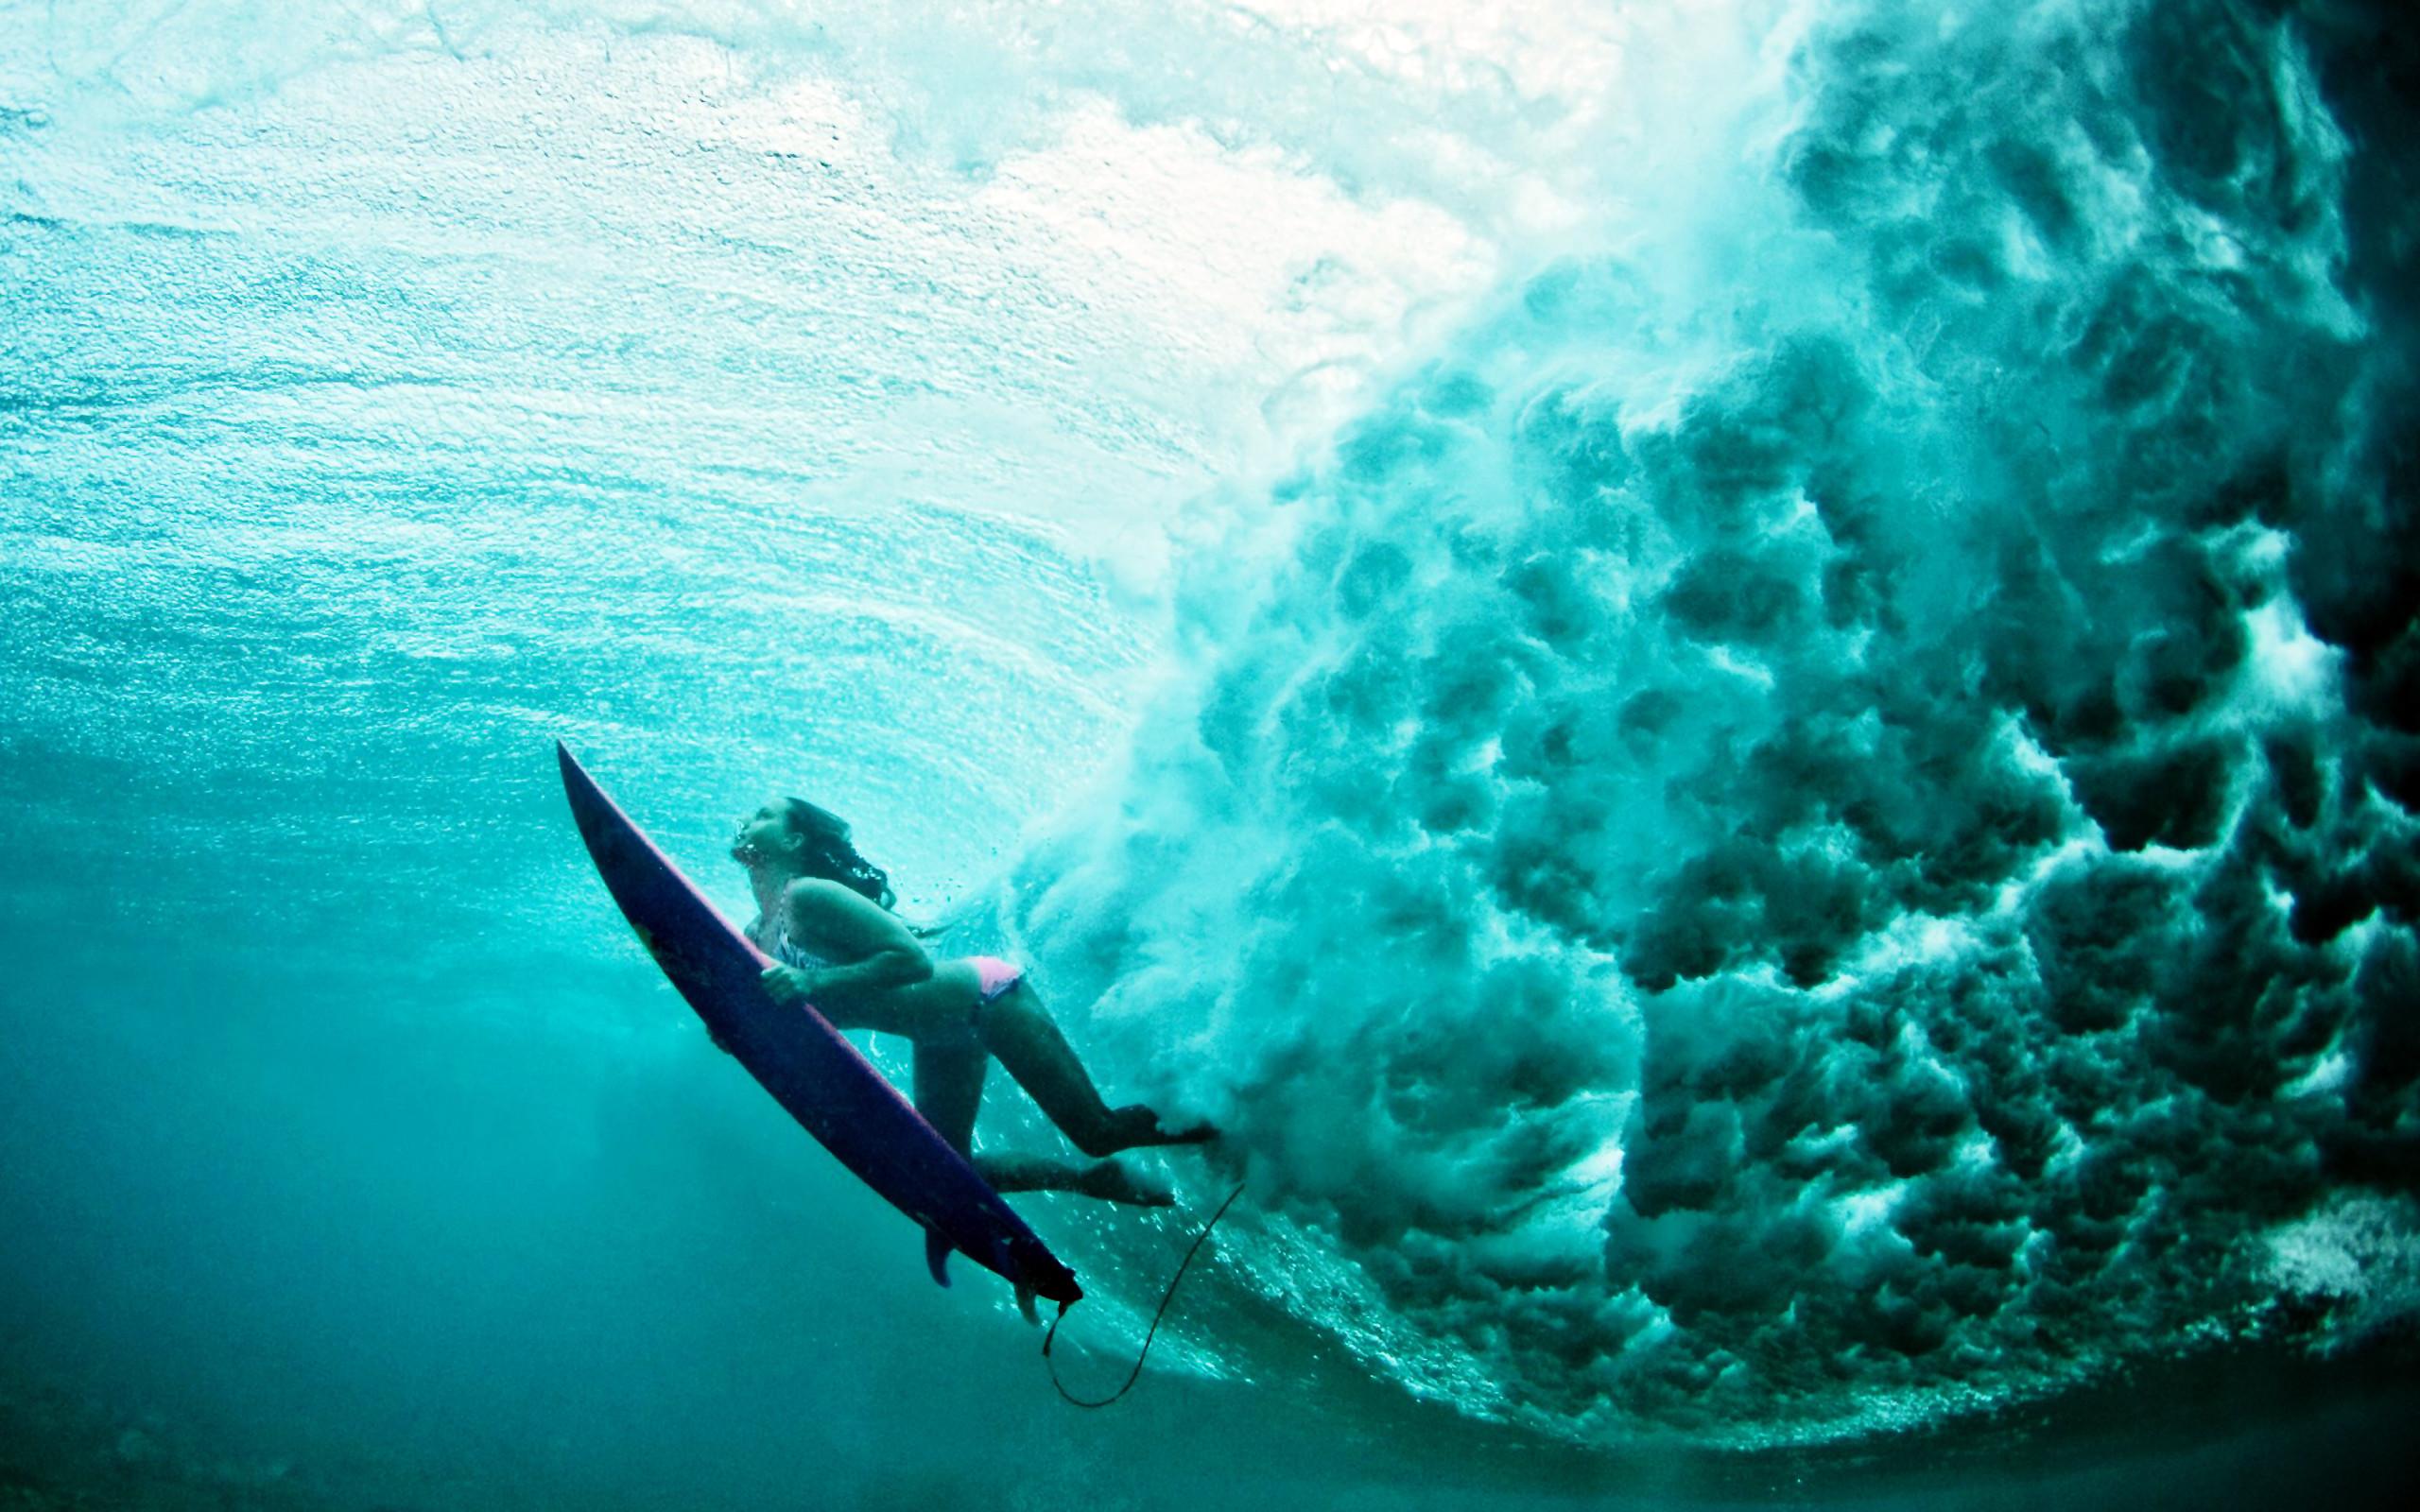 Underwater surf girl wallpaper